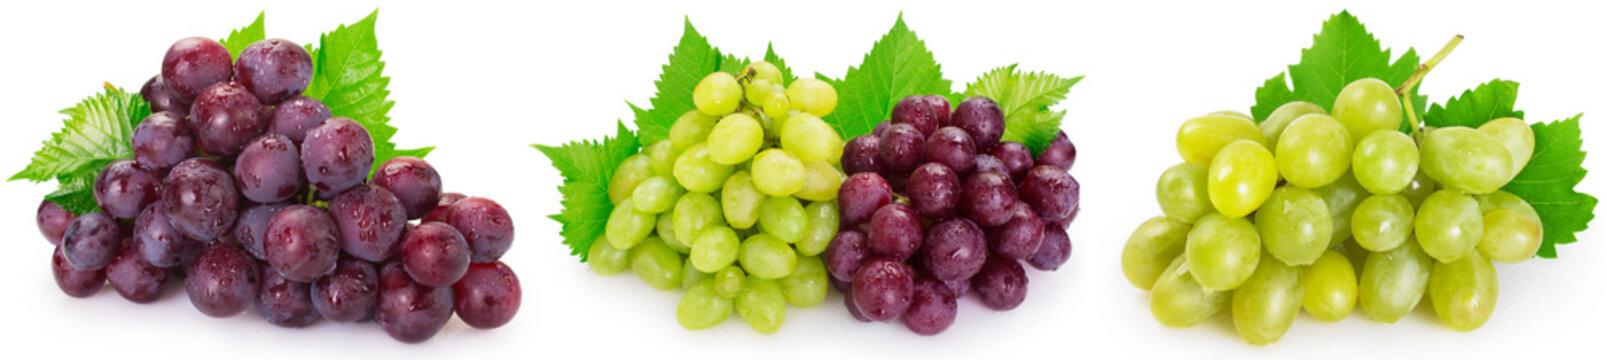 Fresh grape on white background